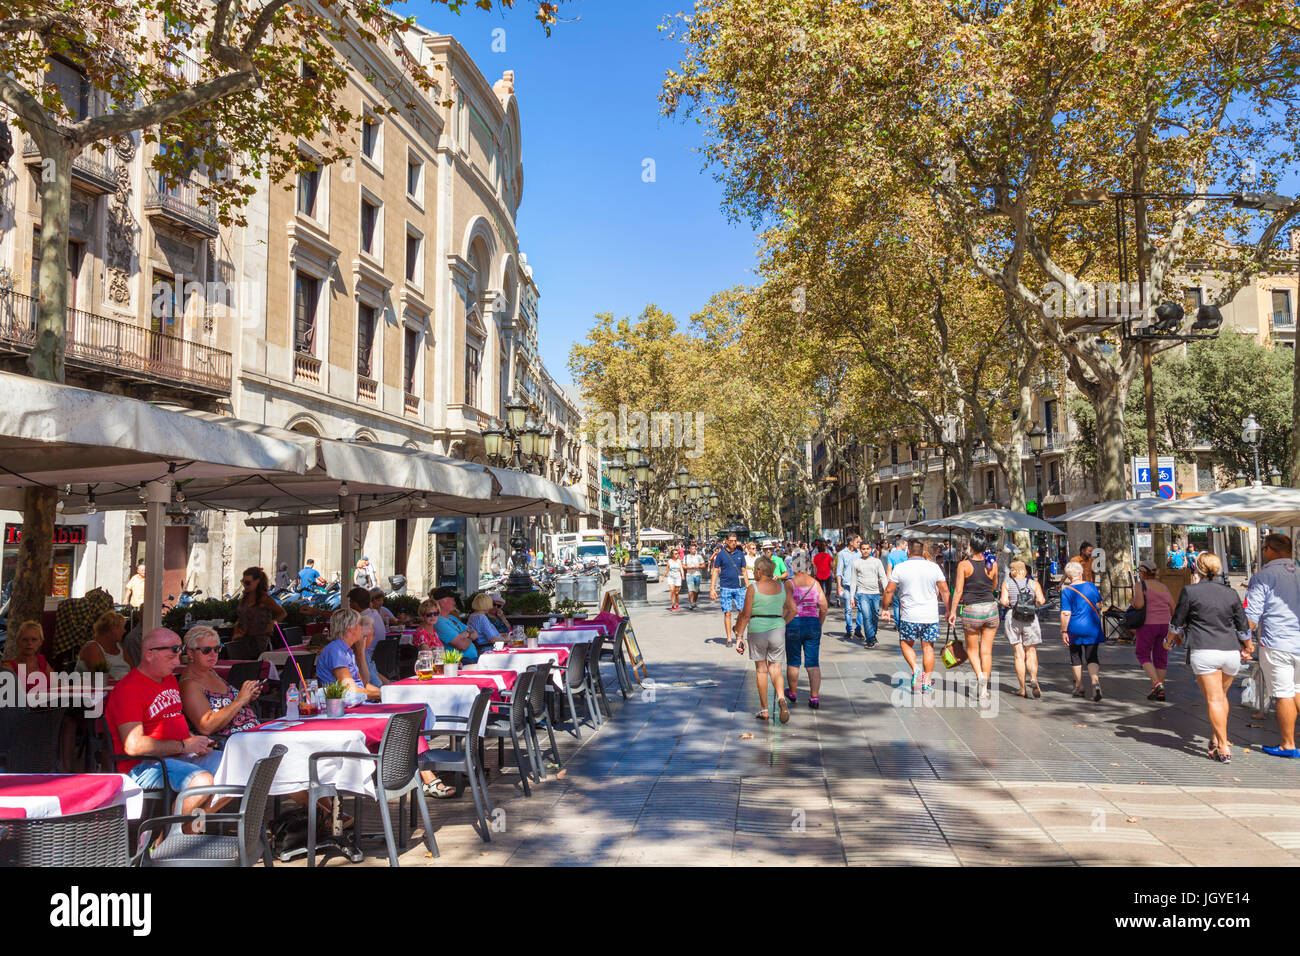 Barcelone Catalogne Espagne Las Ramblas touristes marcher le long de Las Ramblas las Ramblas de Barcelone la rambla Photo Stock